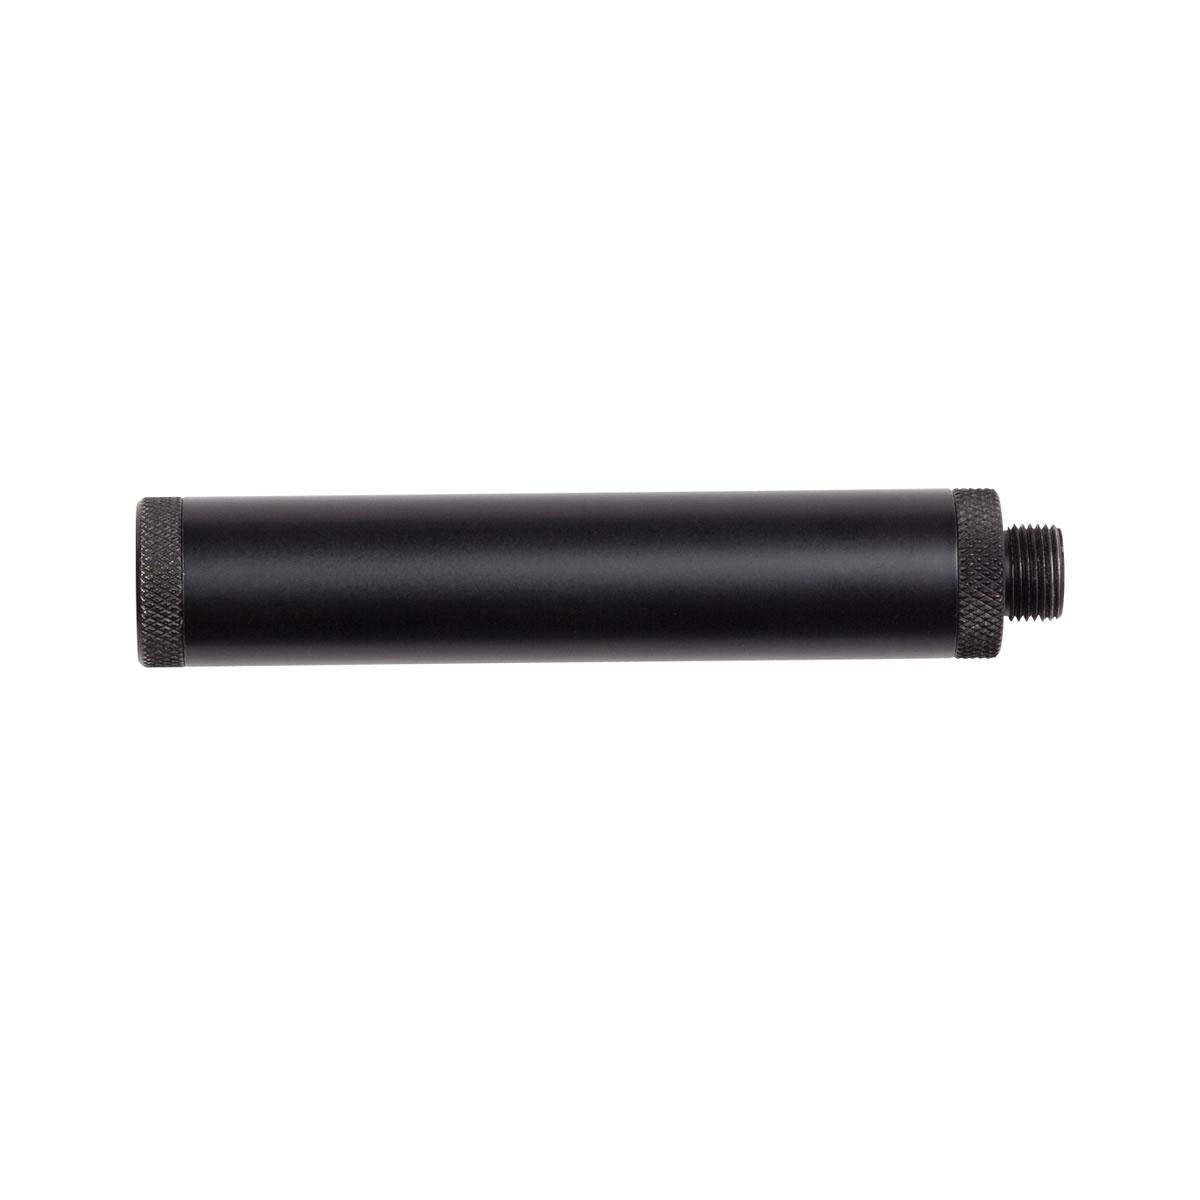 ASG имитация глушителя CZ 75D Compact15924Характеристики: Материал: металл. Размер глушителя: 11 см х 2 см х 2 см. Размер упаковки: 14,5 см х 6 см х 3,5 см.